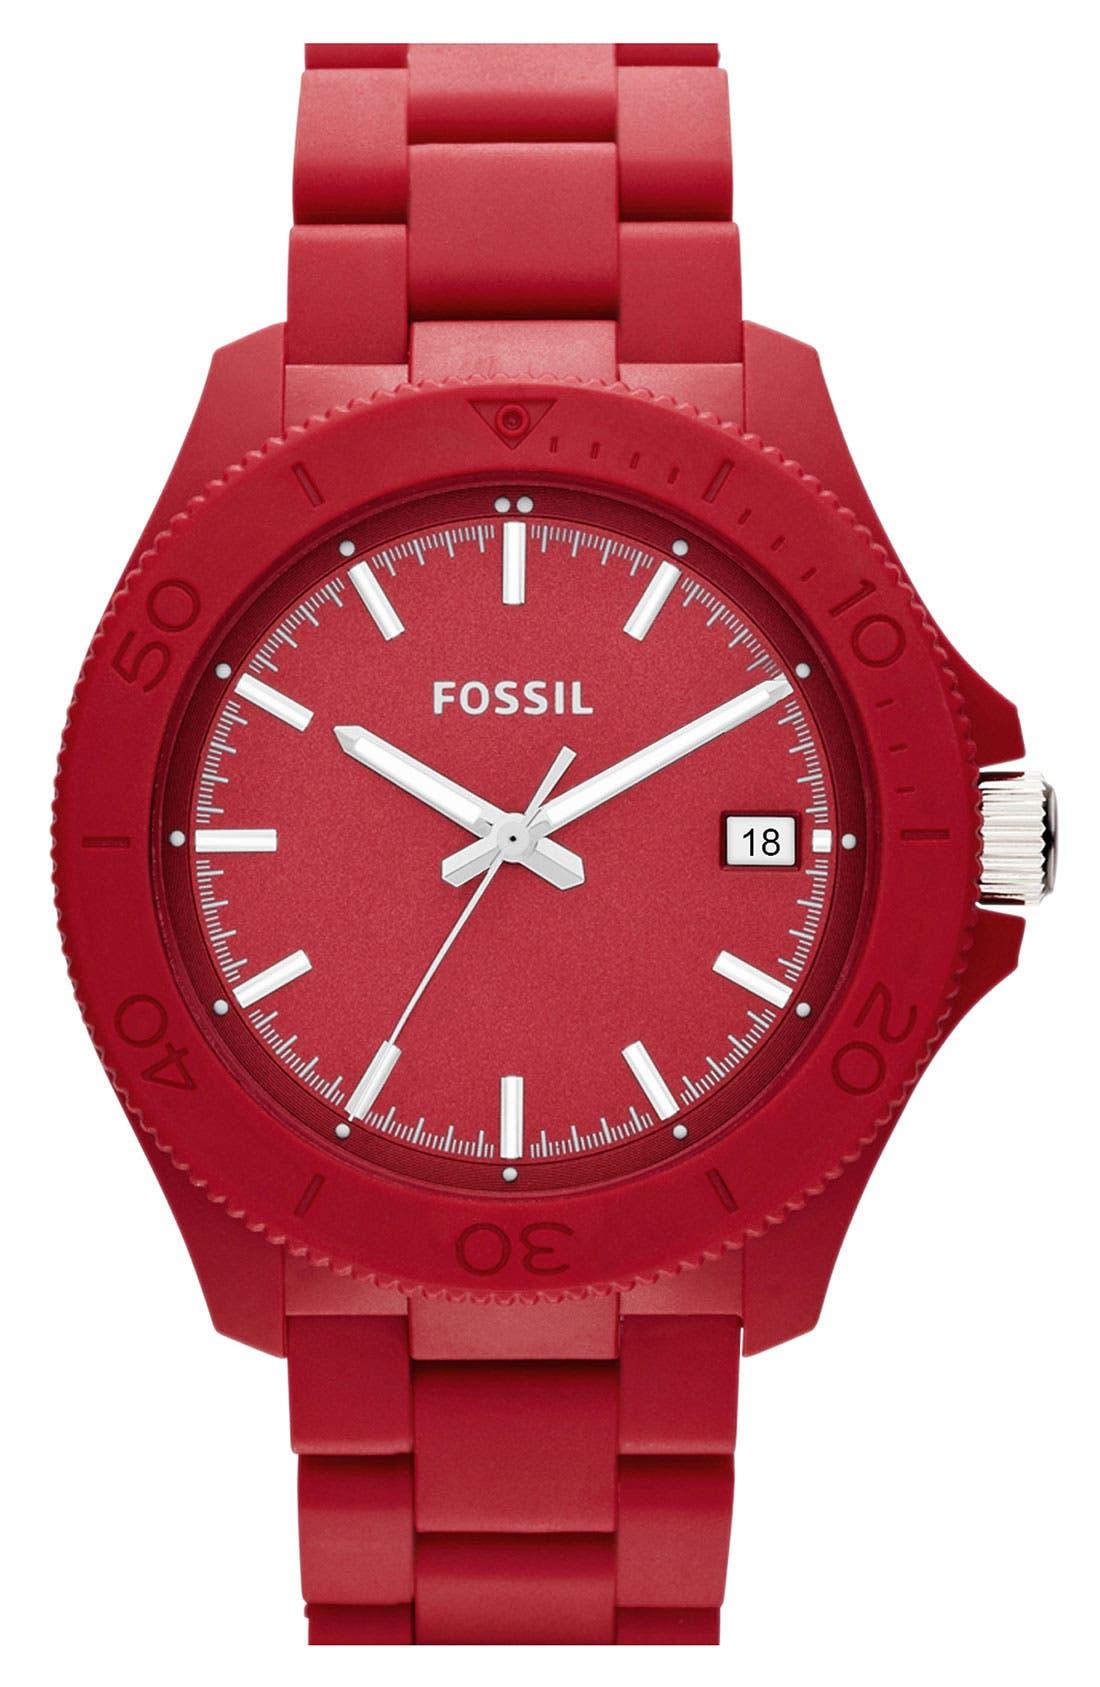 Main Image - Fossil 'Retro Traveler' Resin Bracelet Watch, 44mm